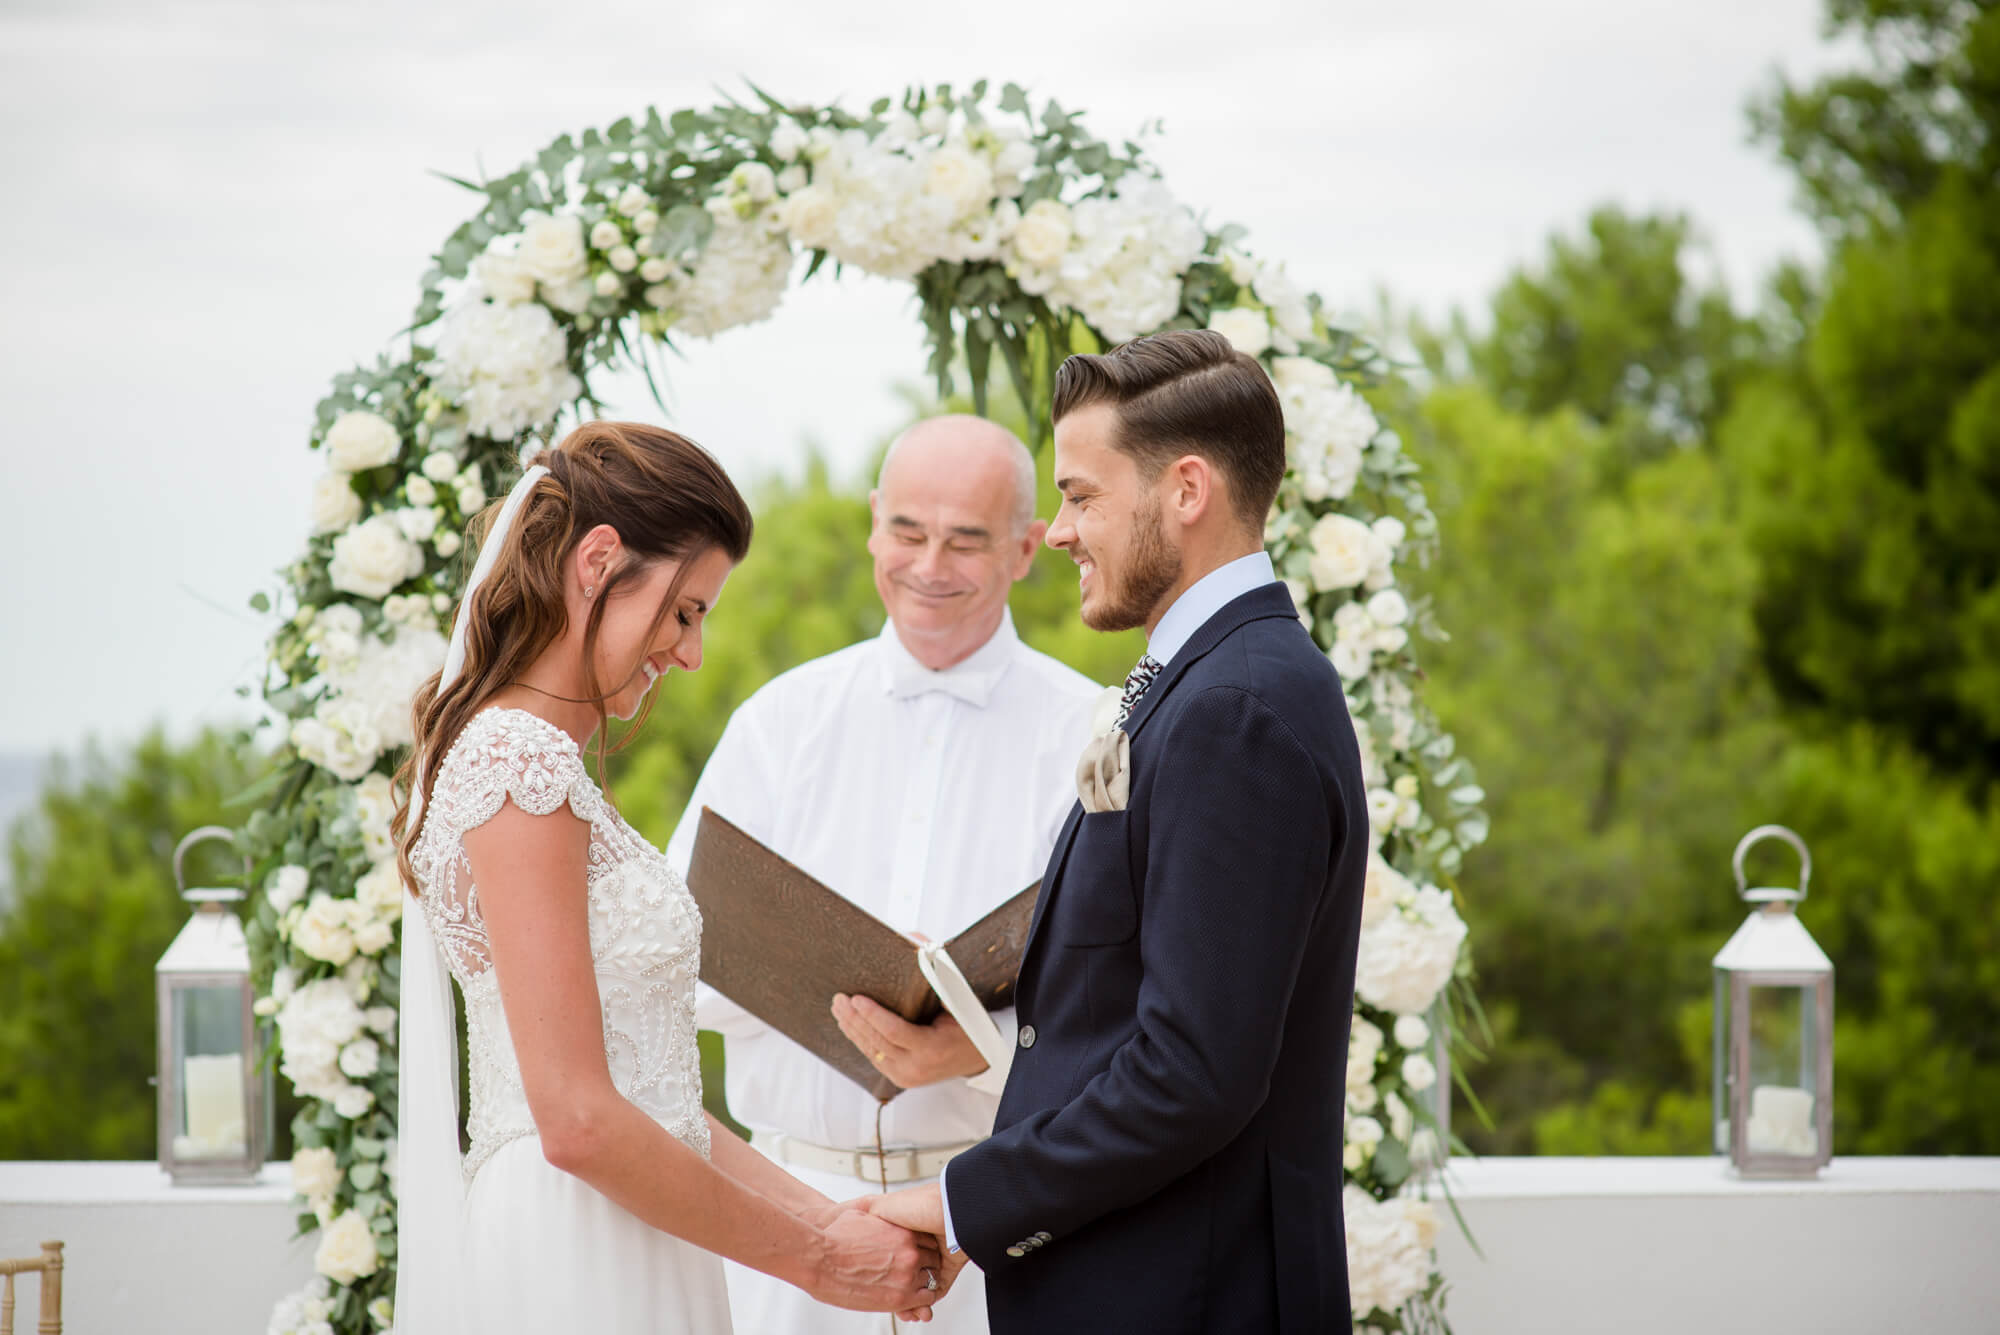 bride groom ceremony vows white flower arch wedding flowers